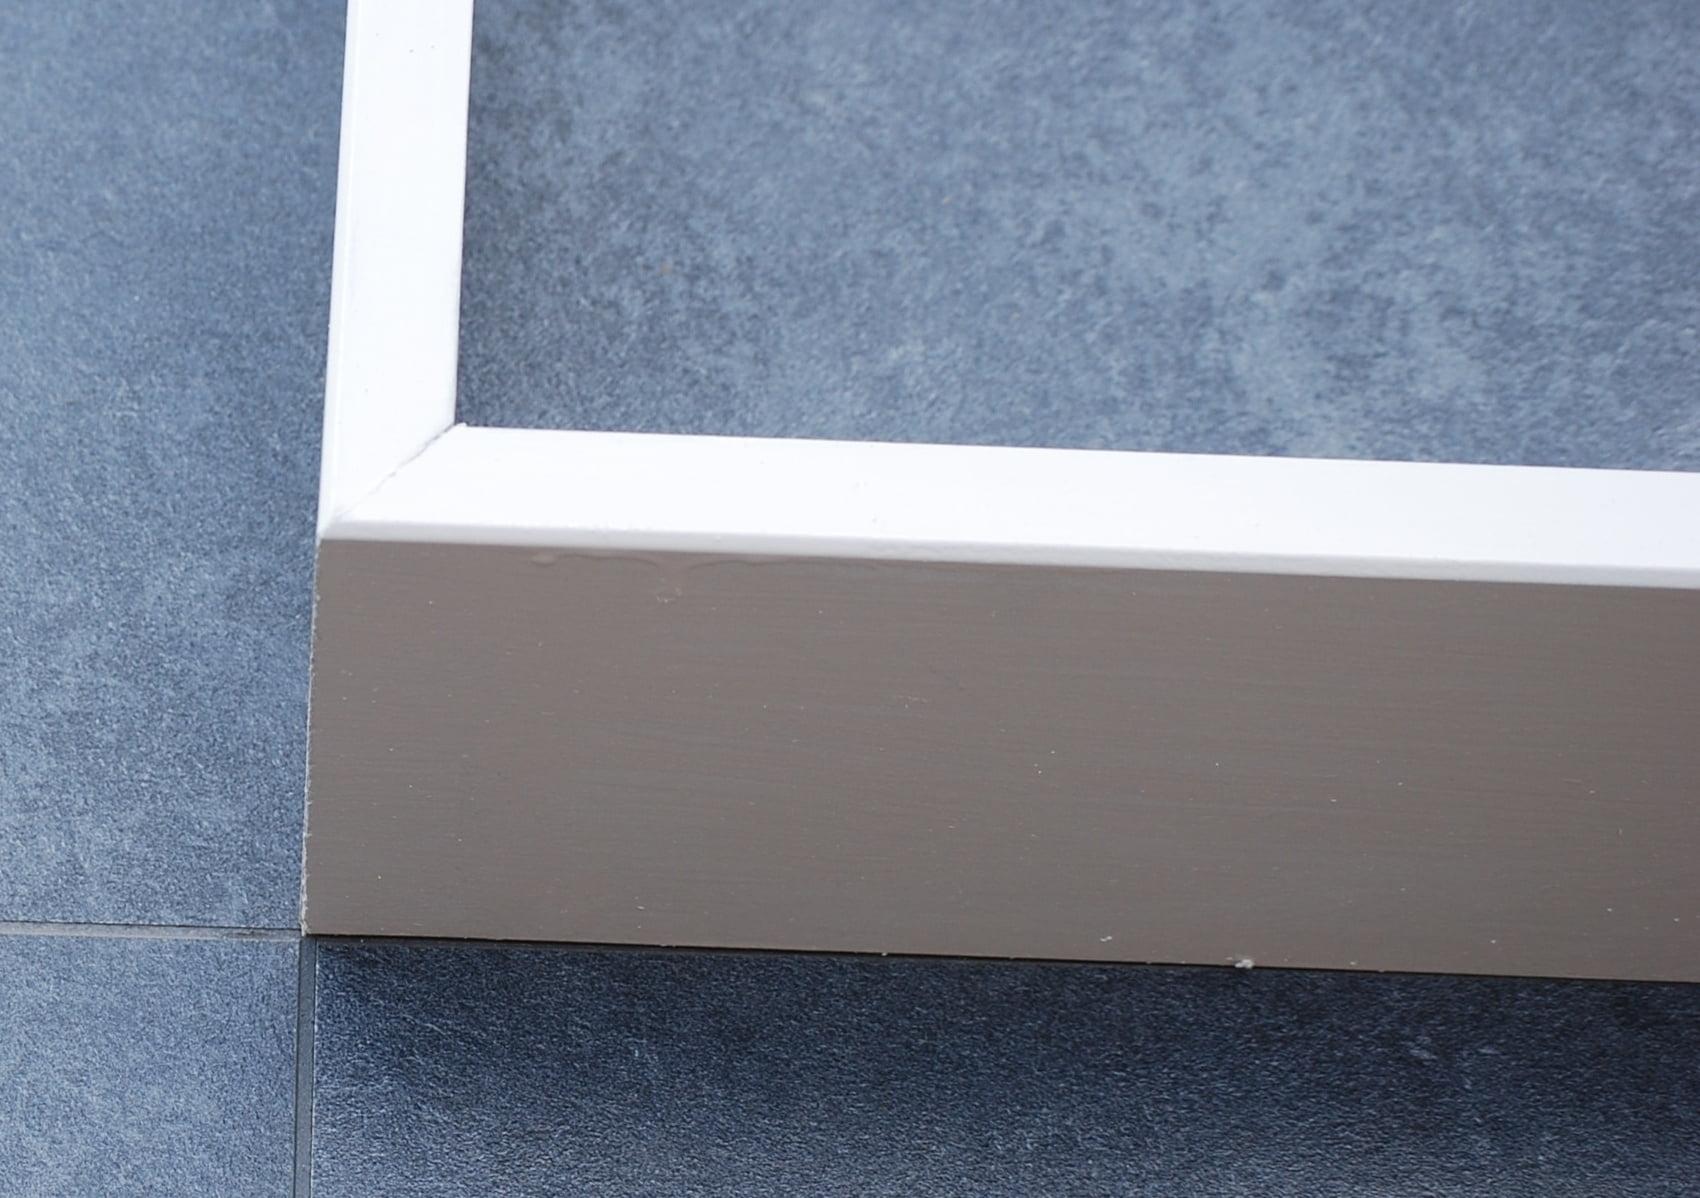 Mdf moderne plint wit gegrond all in laminaat